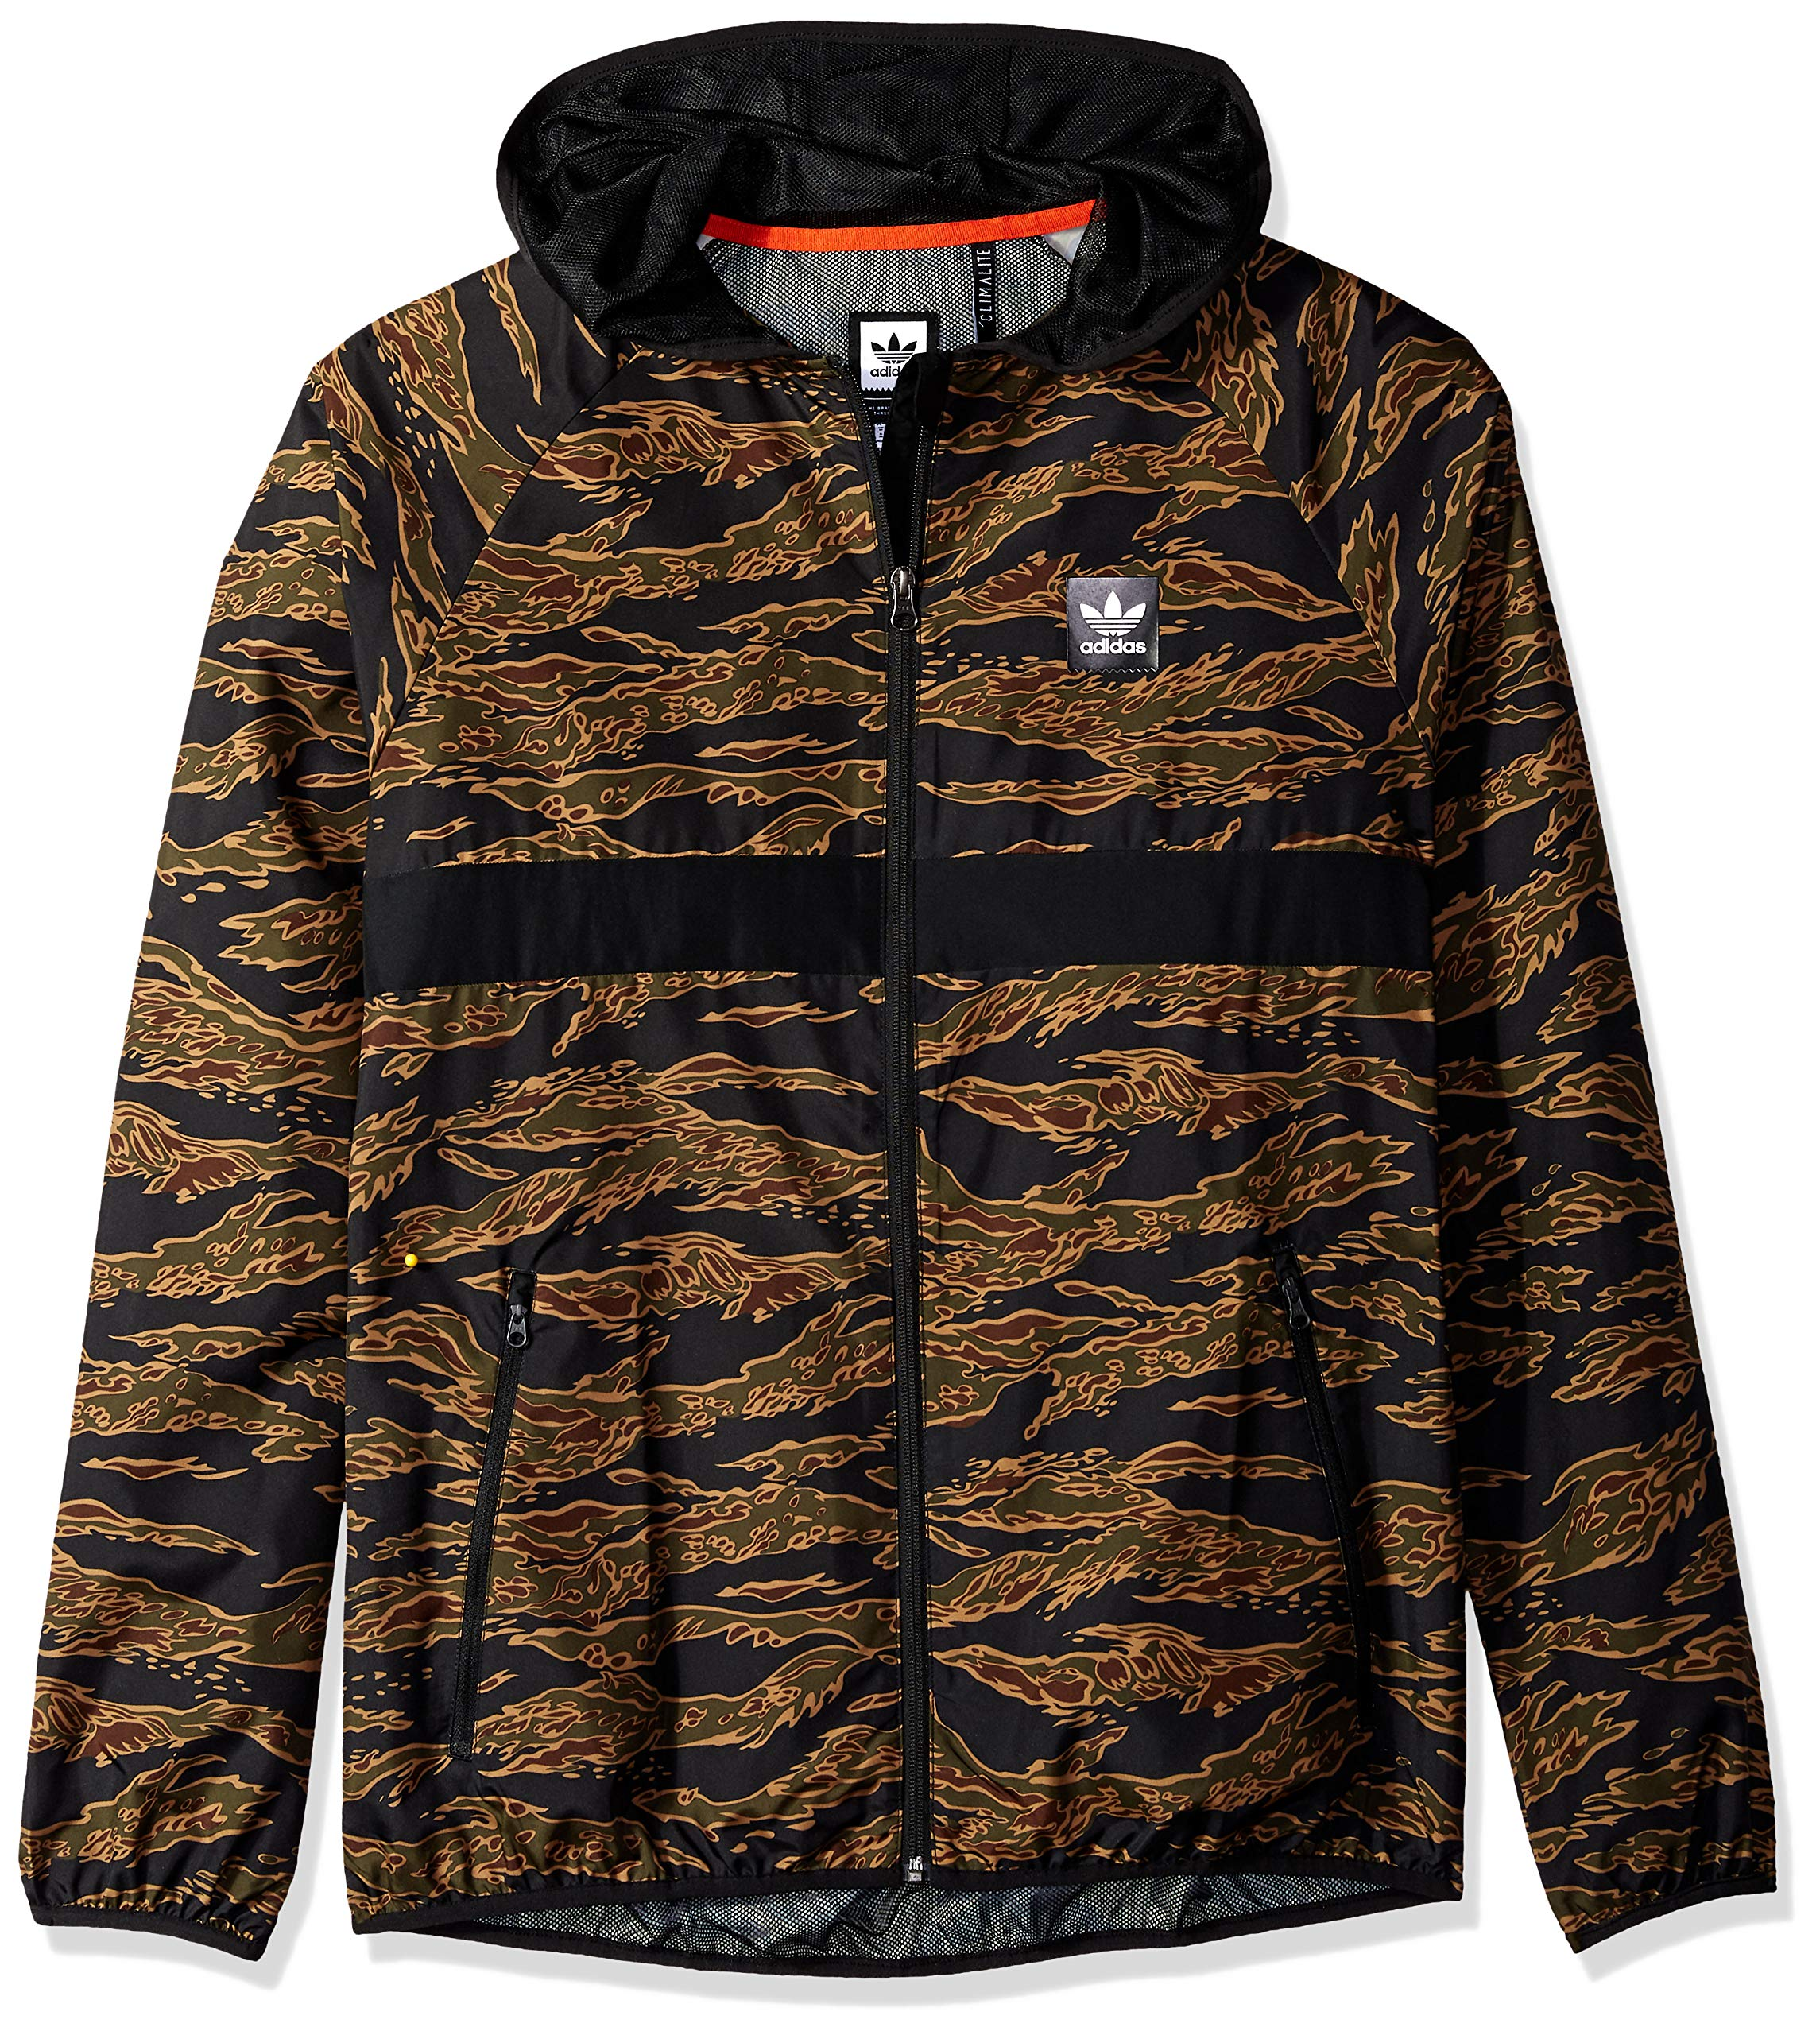 adidas Originals Men's Skateboarding Camo All Over Print Packable Wind Jacket, Camo Print/Black/Collegiate Orange, M